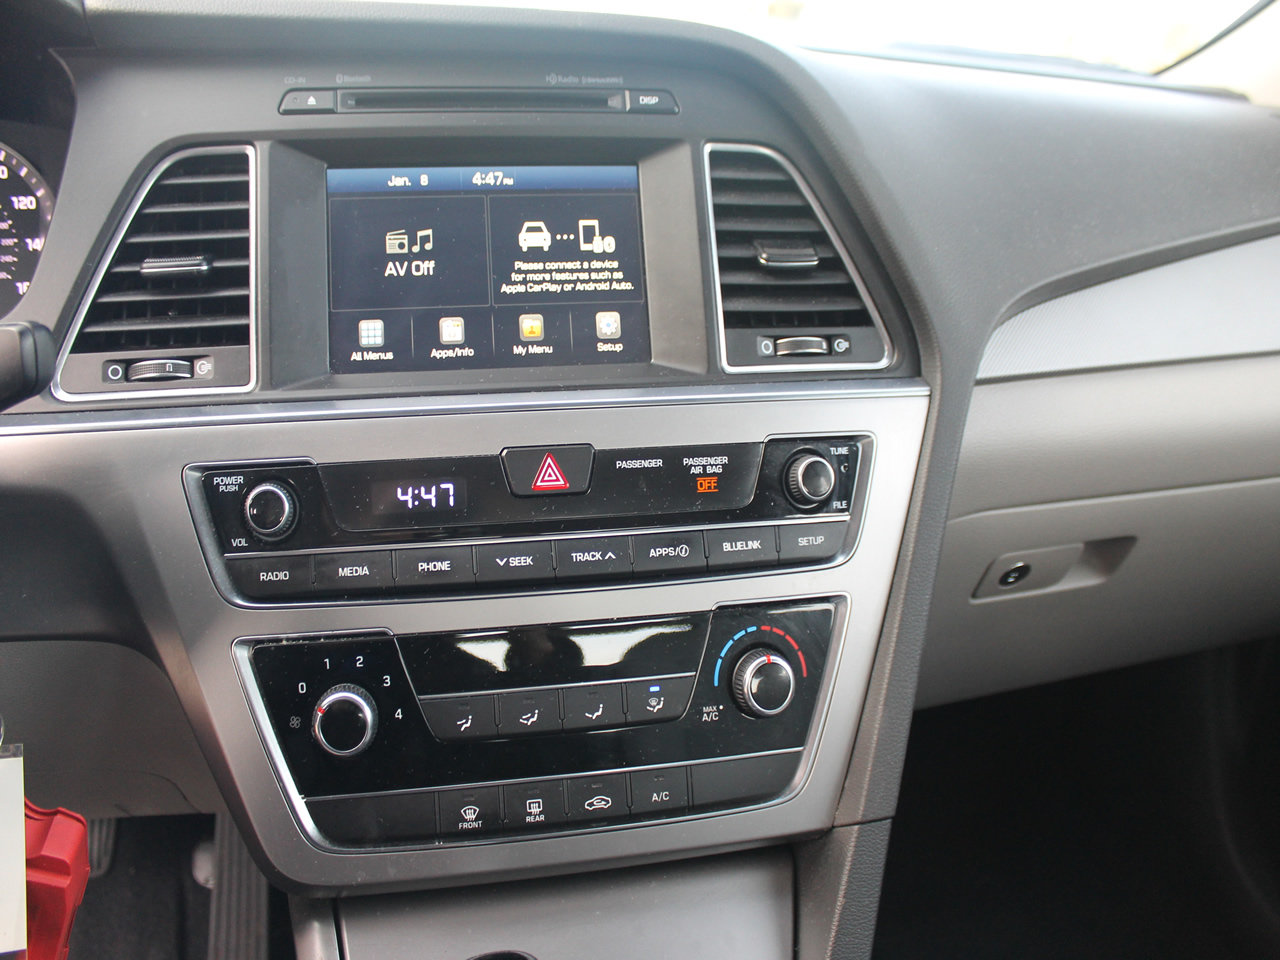 Dick Smith Hyundai >> USED 2016 HYUNDAI SONATA ECO VIN 5NPE24AA0GH391002 - Hyundai in Greenville | Hyundai Anderson ...